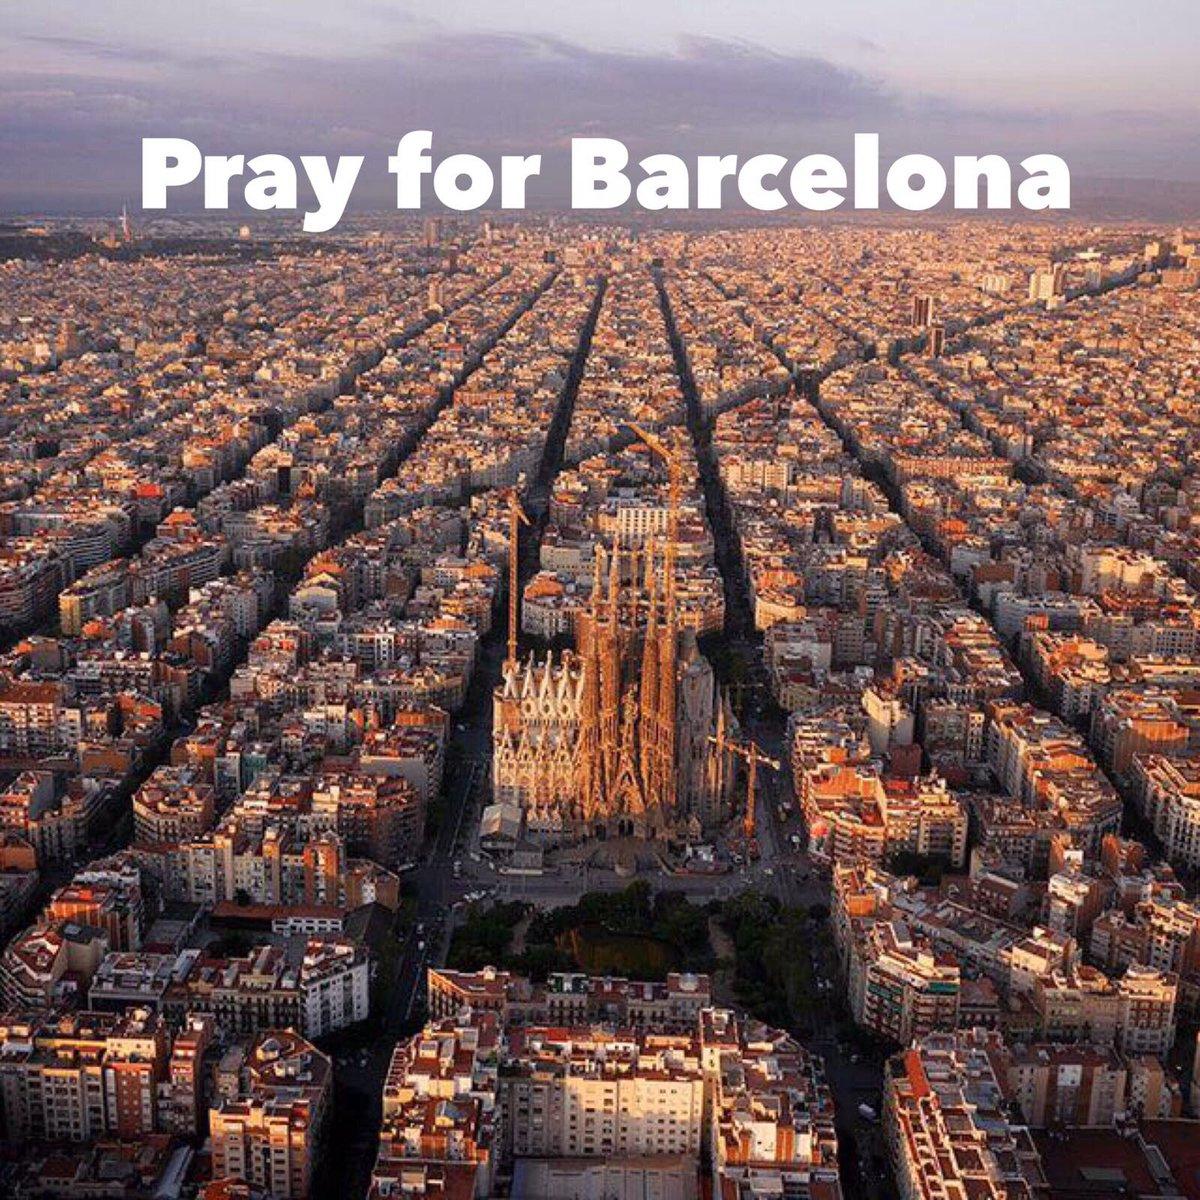 My home, the city i love, #PrayforBarcelona #barcelona https://t.co/uXiD7pnhji